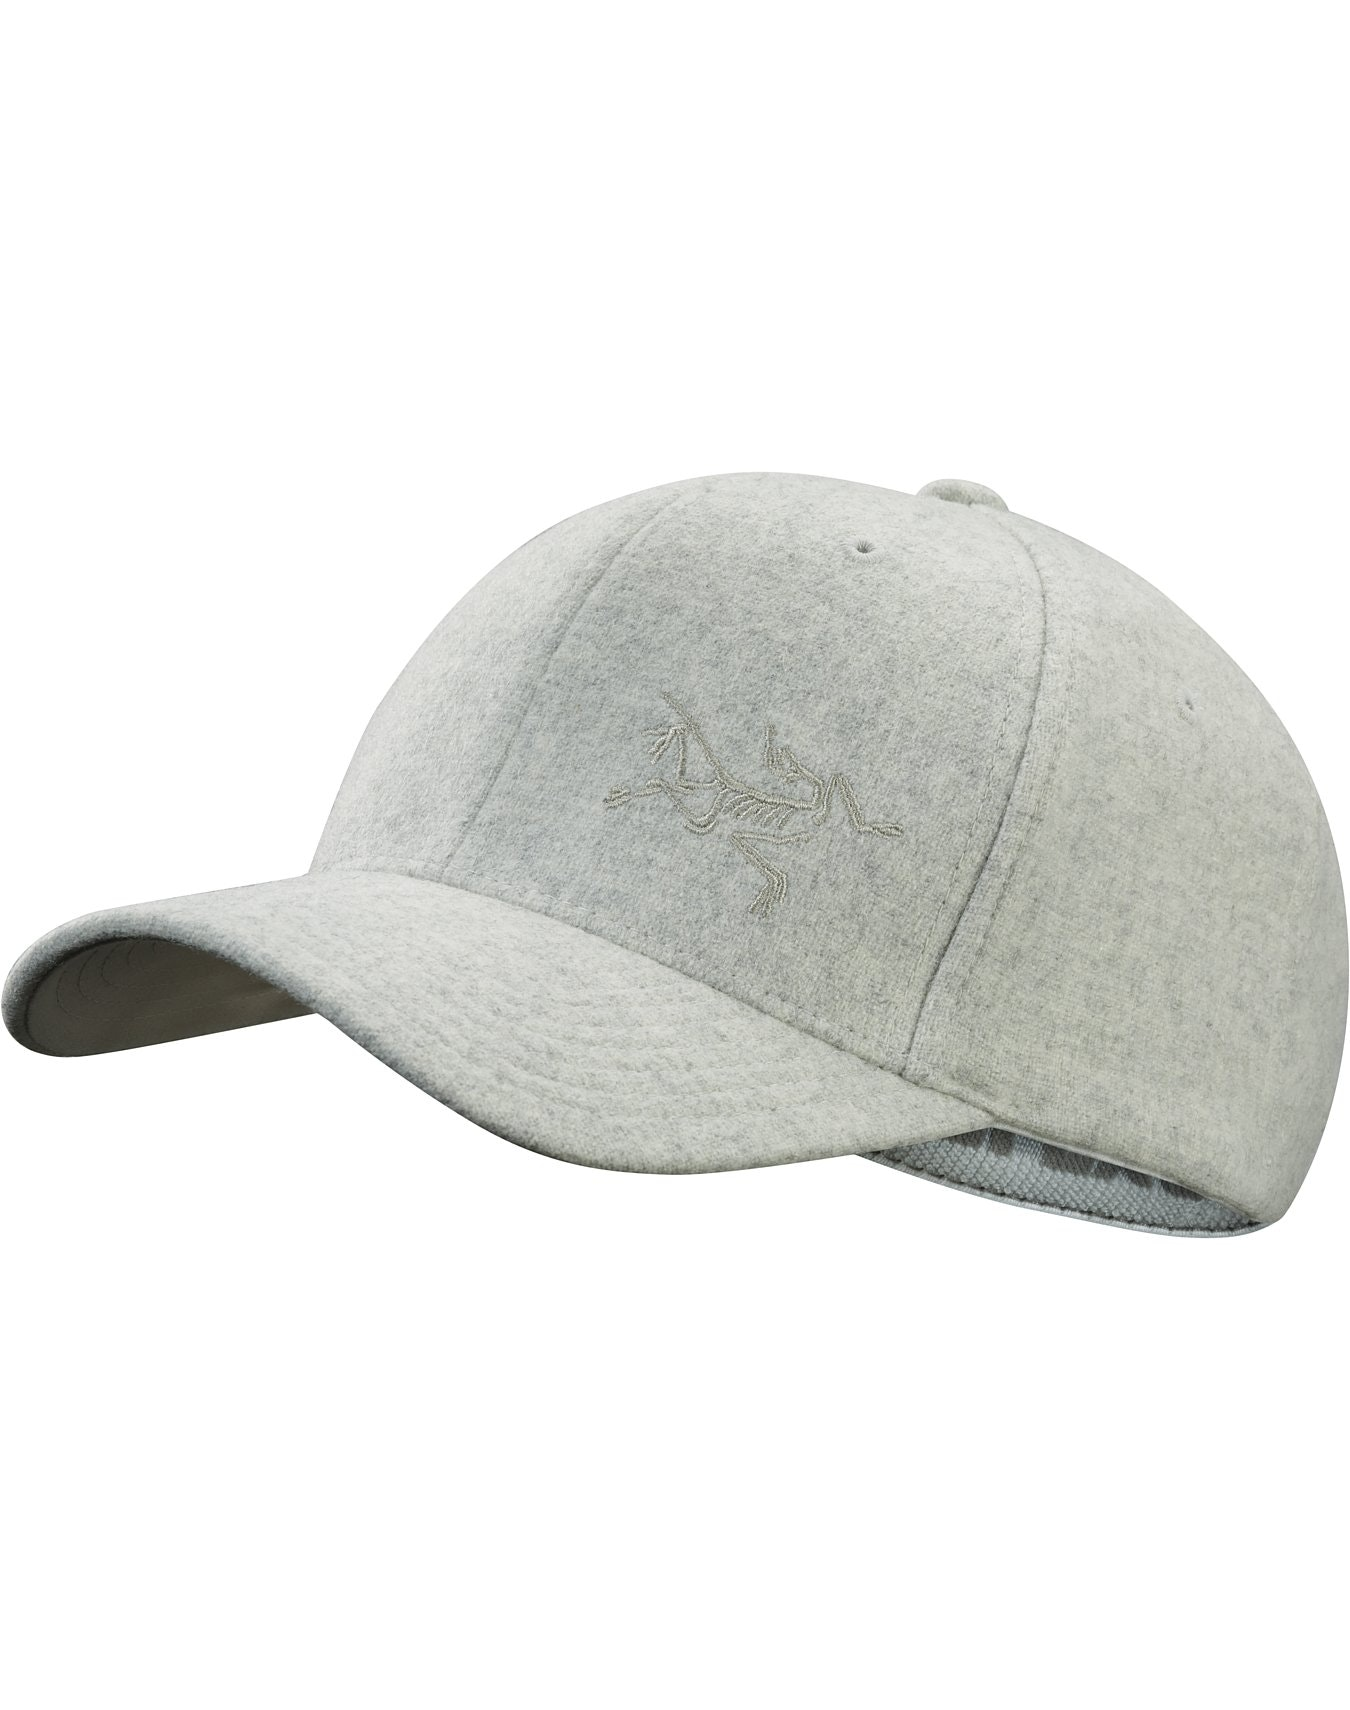 91e35049 Big Accessories Baseball Cap Solid Hats for Men for sale | eBay